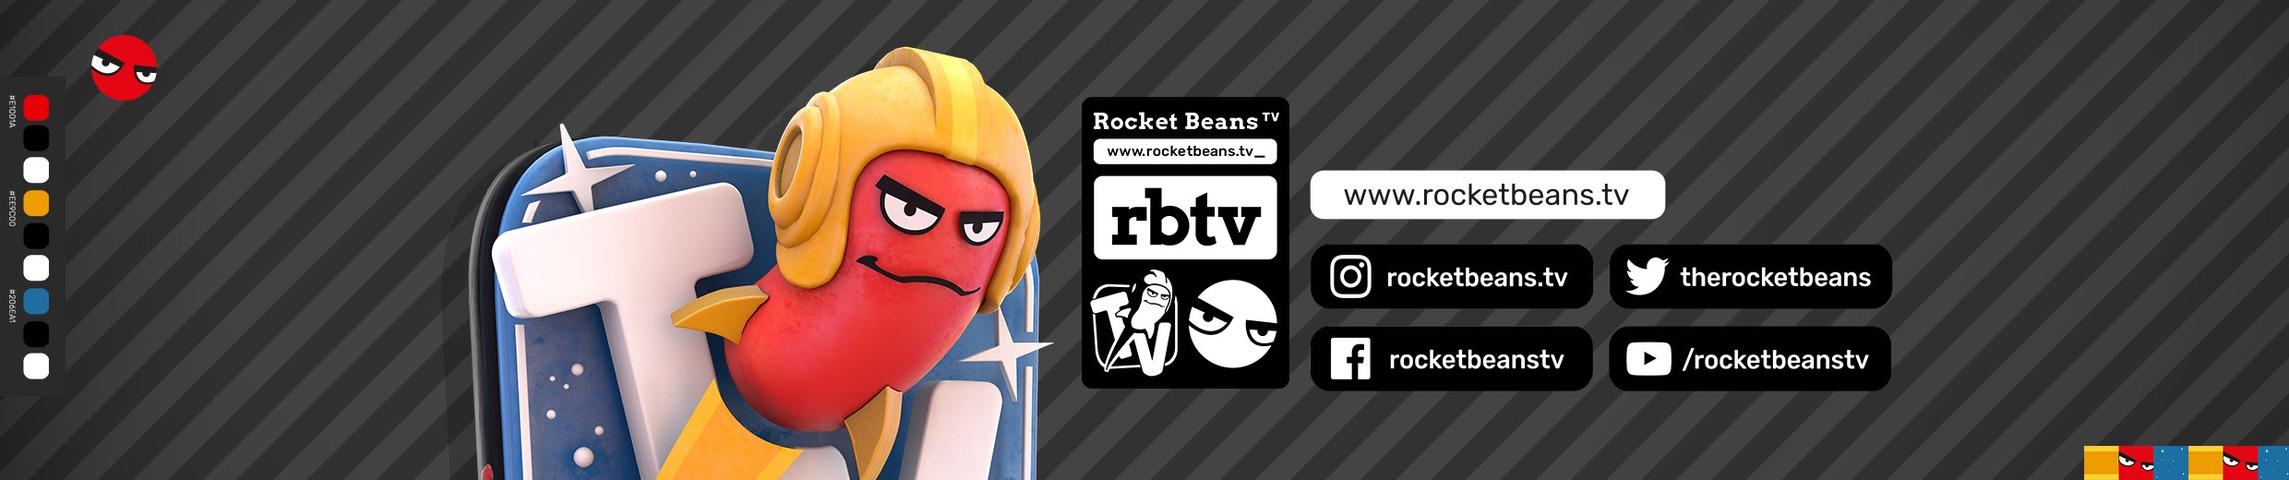 RocketBeansTV